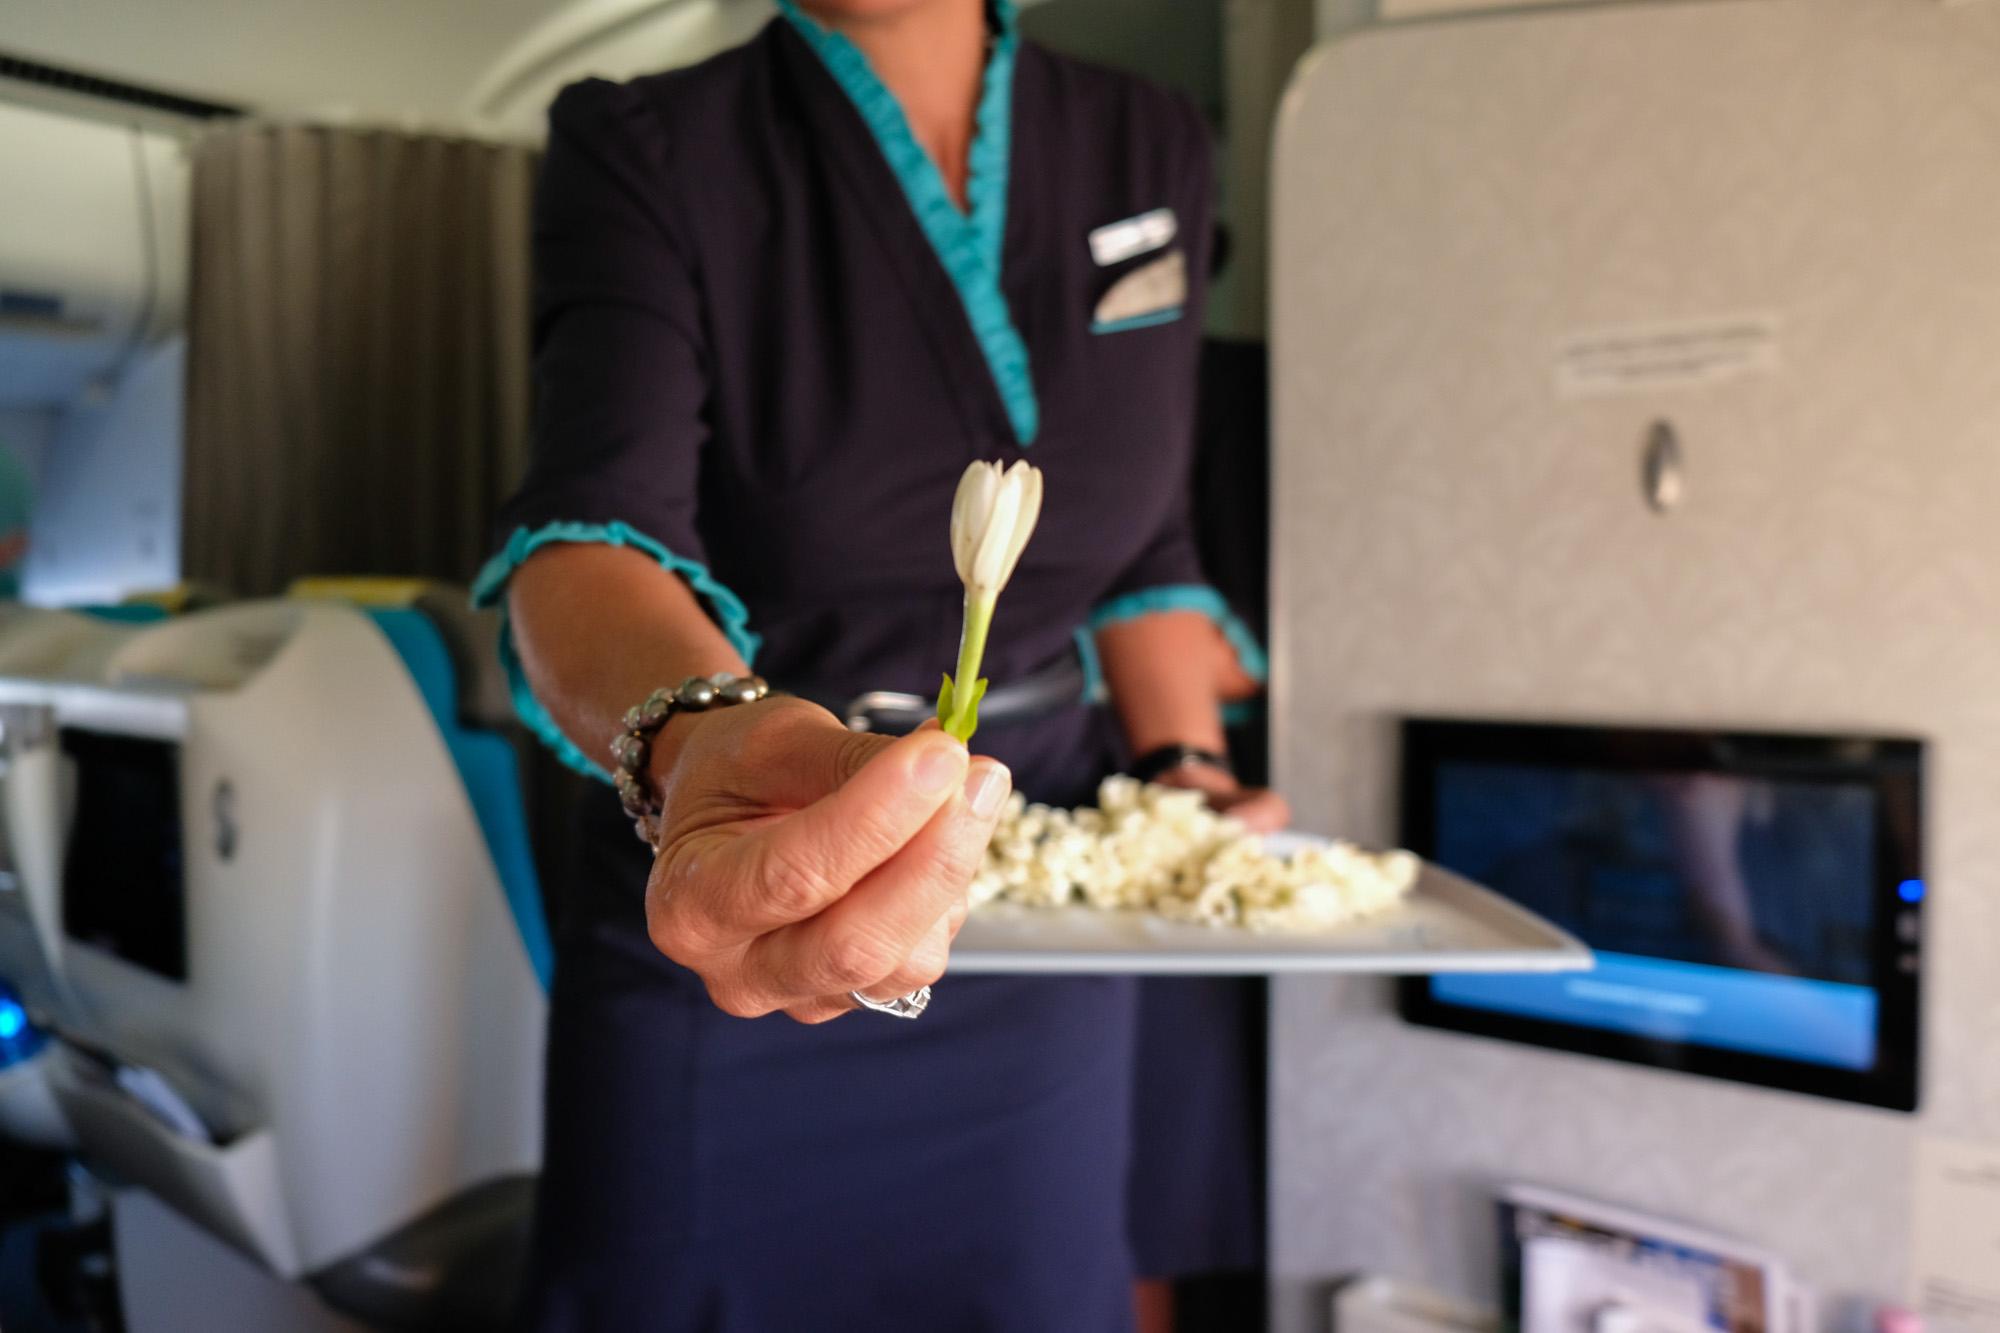 Air Tahiti Nui Business Class Flight from LA to Tahiti